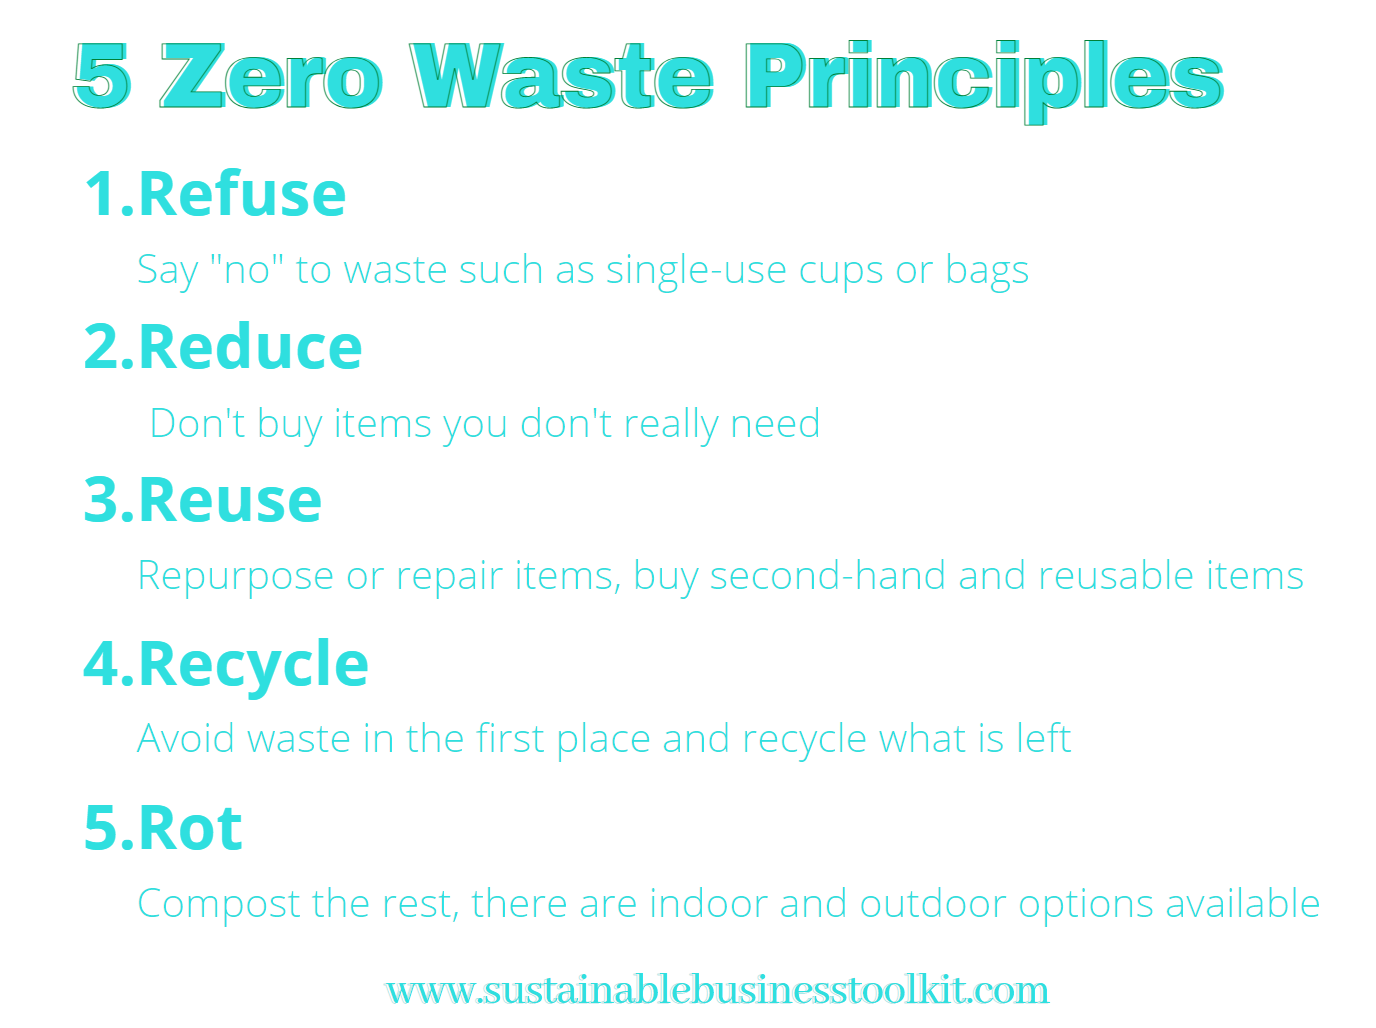 5 Zero Waste Principles